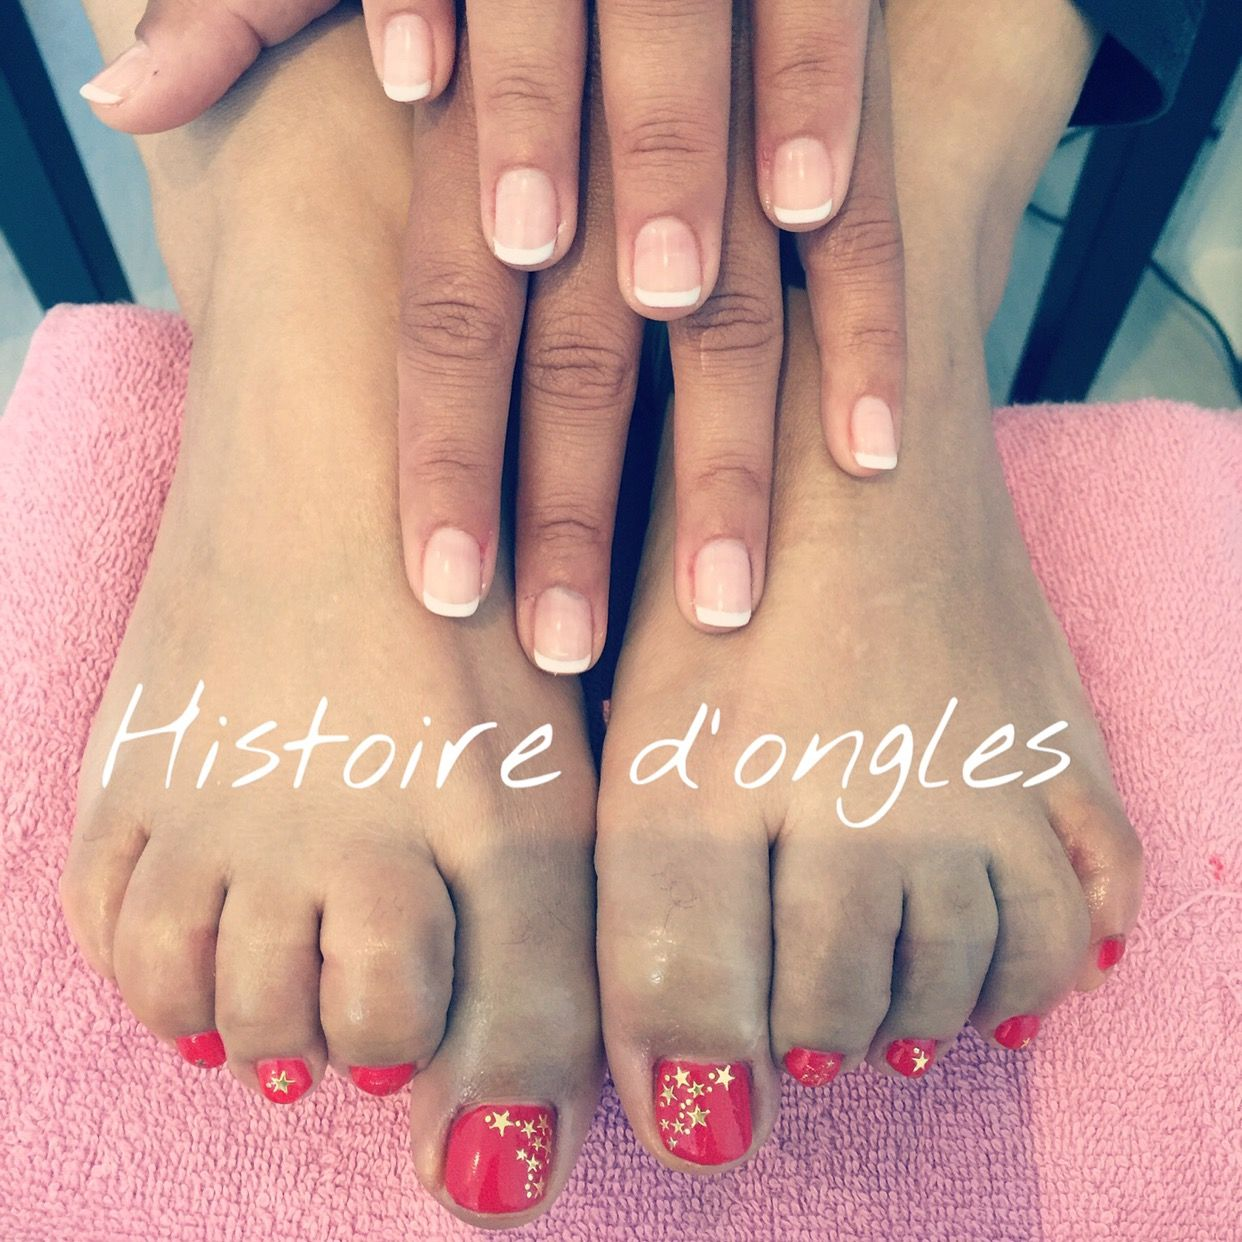 About baby boomer nail art tutorial by nded on pinterest nail art -  Histoiredongleslarochelle Pronails Semipermanent Vernis Nailart